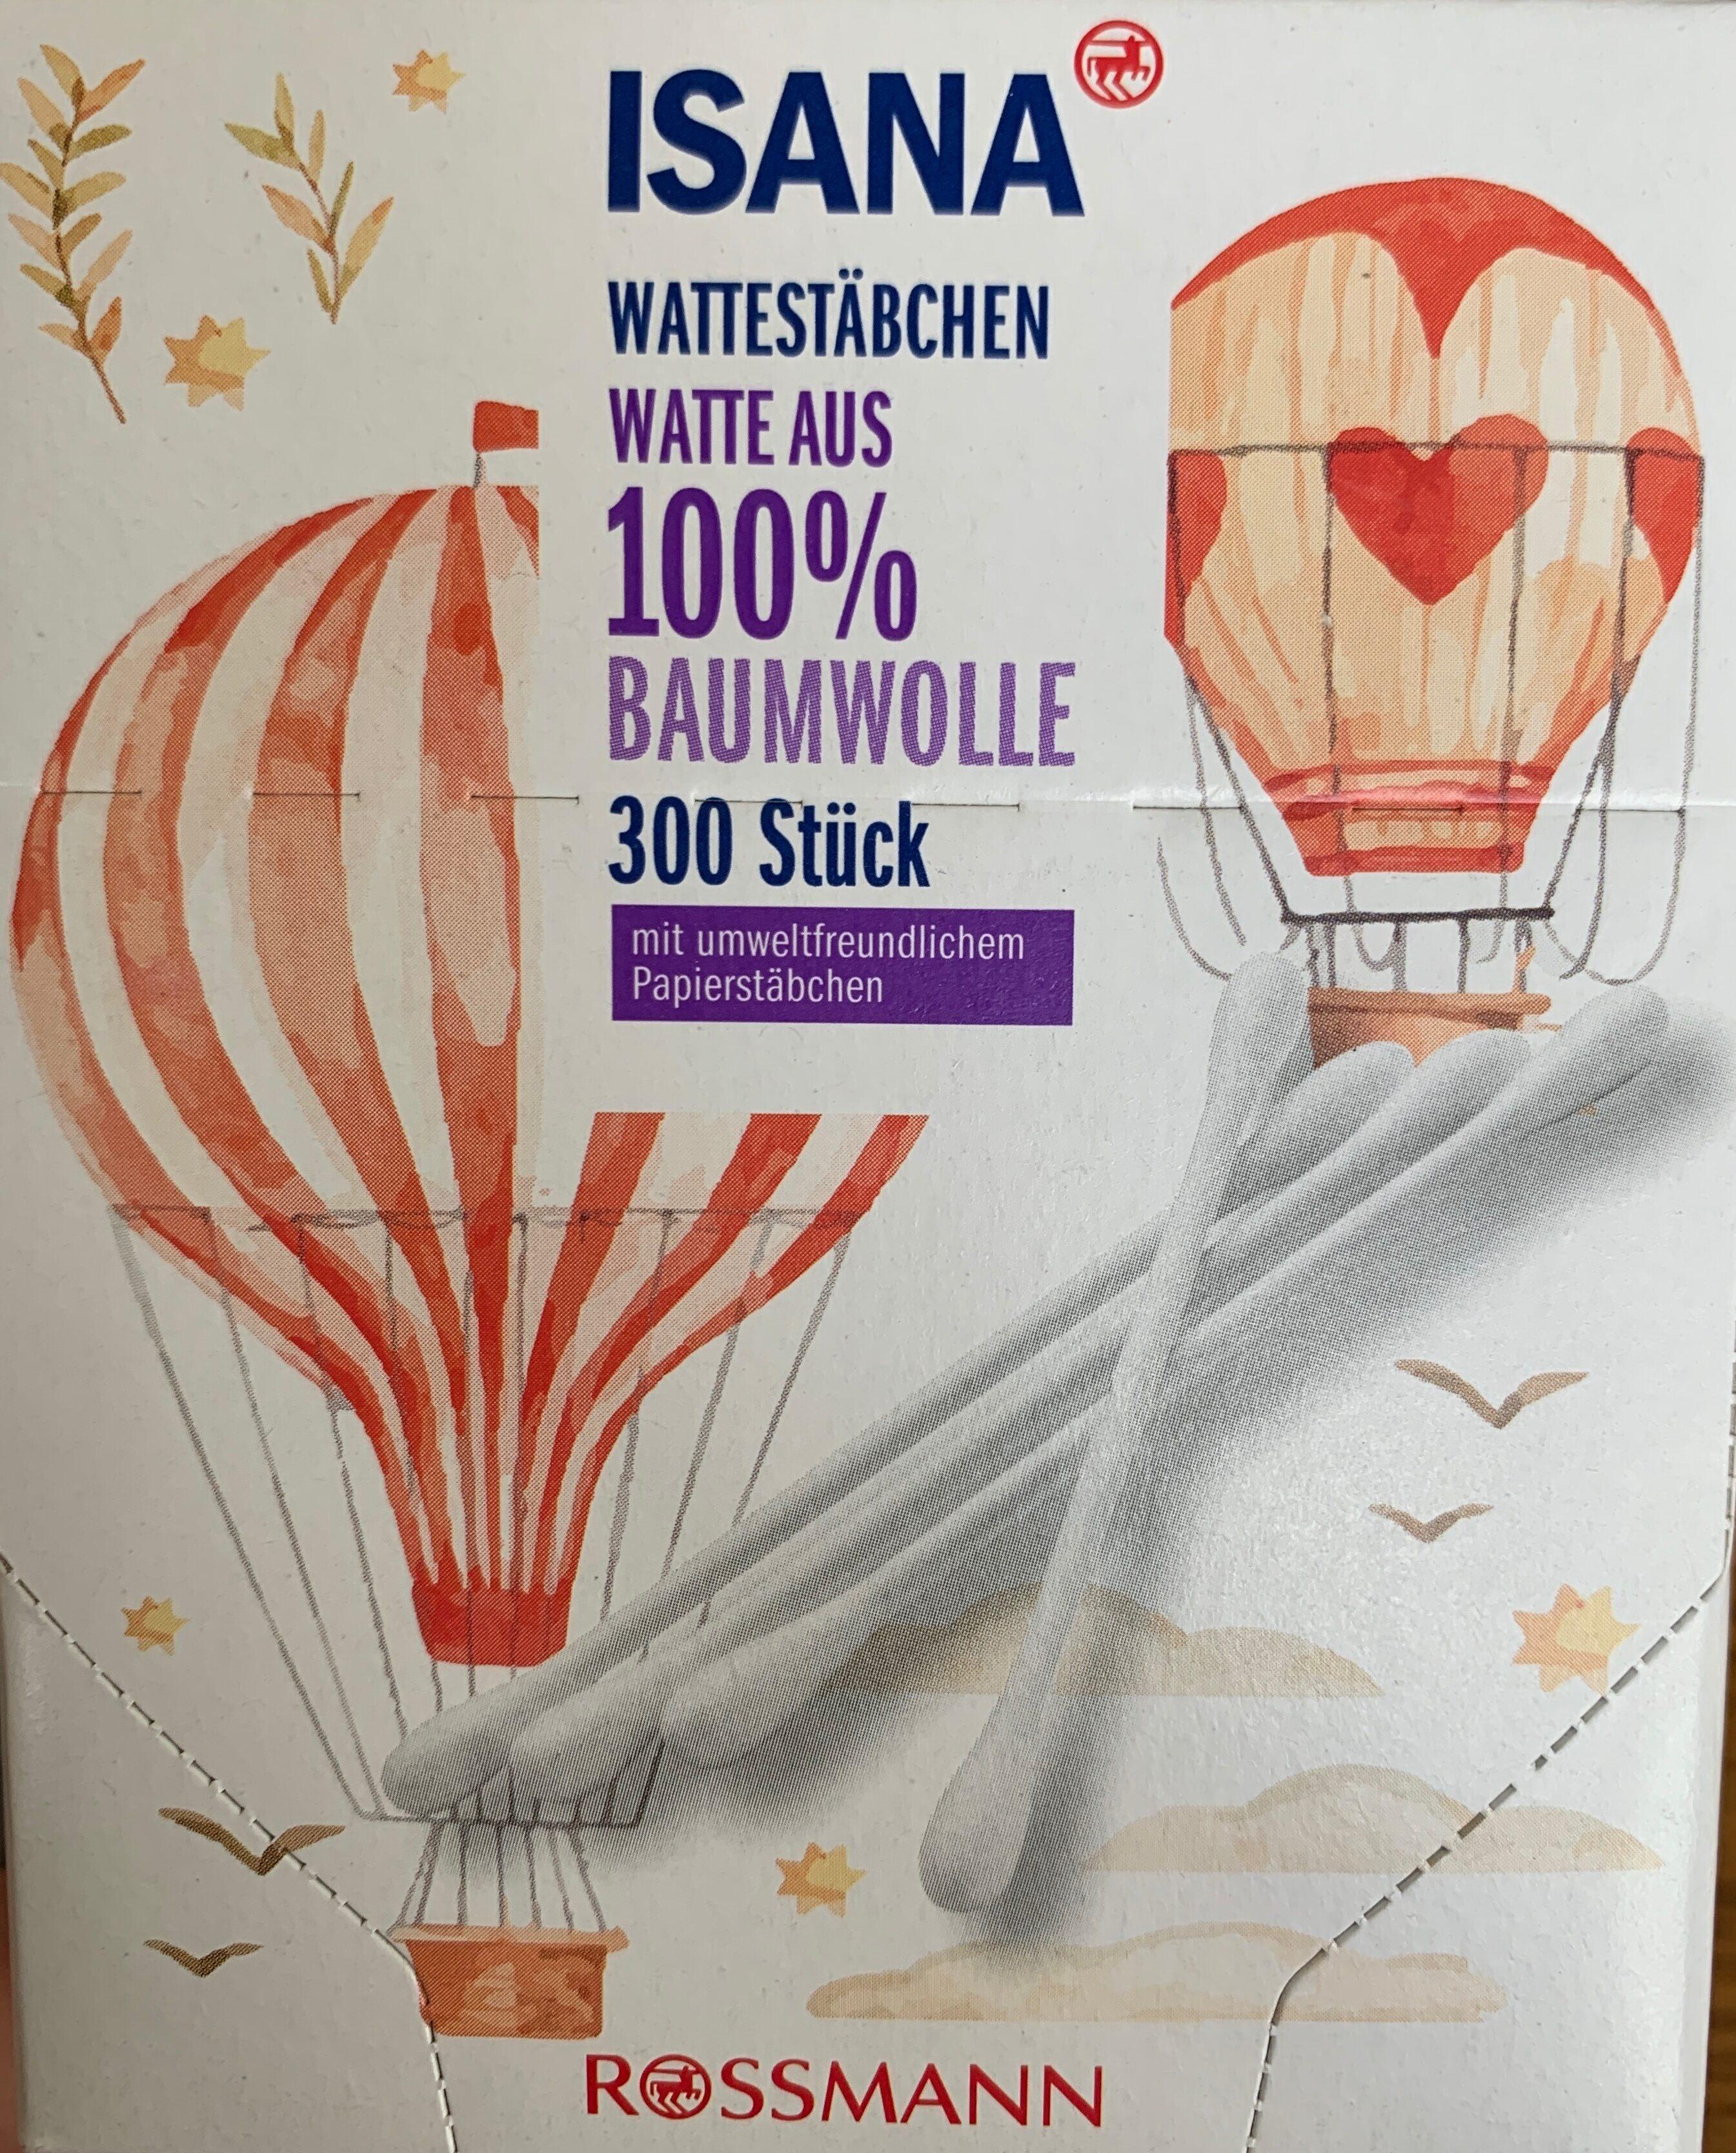 Wattestäbchen - Product - de